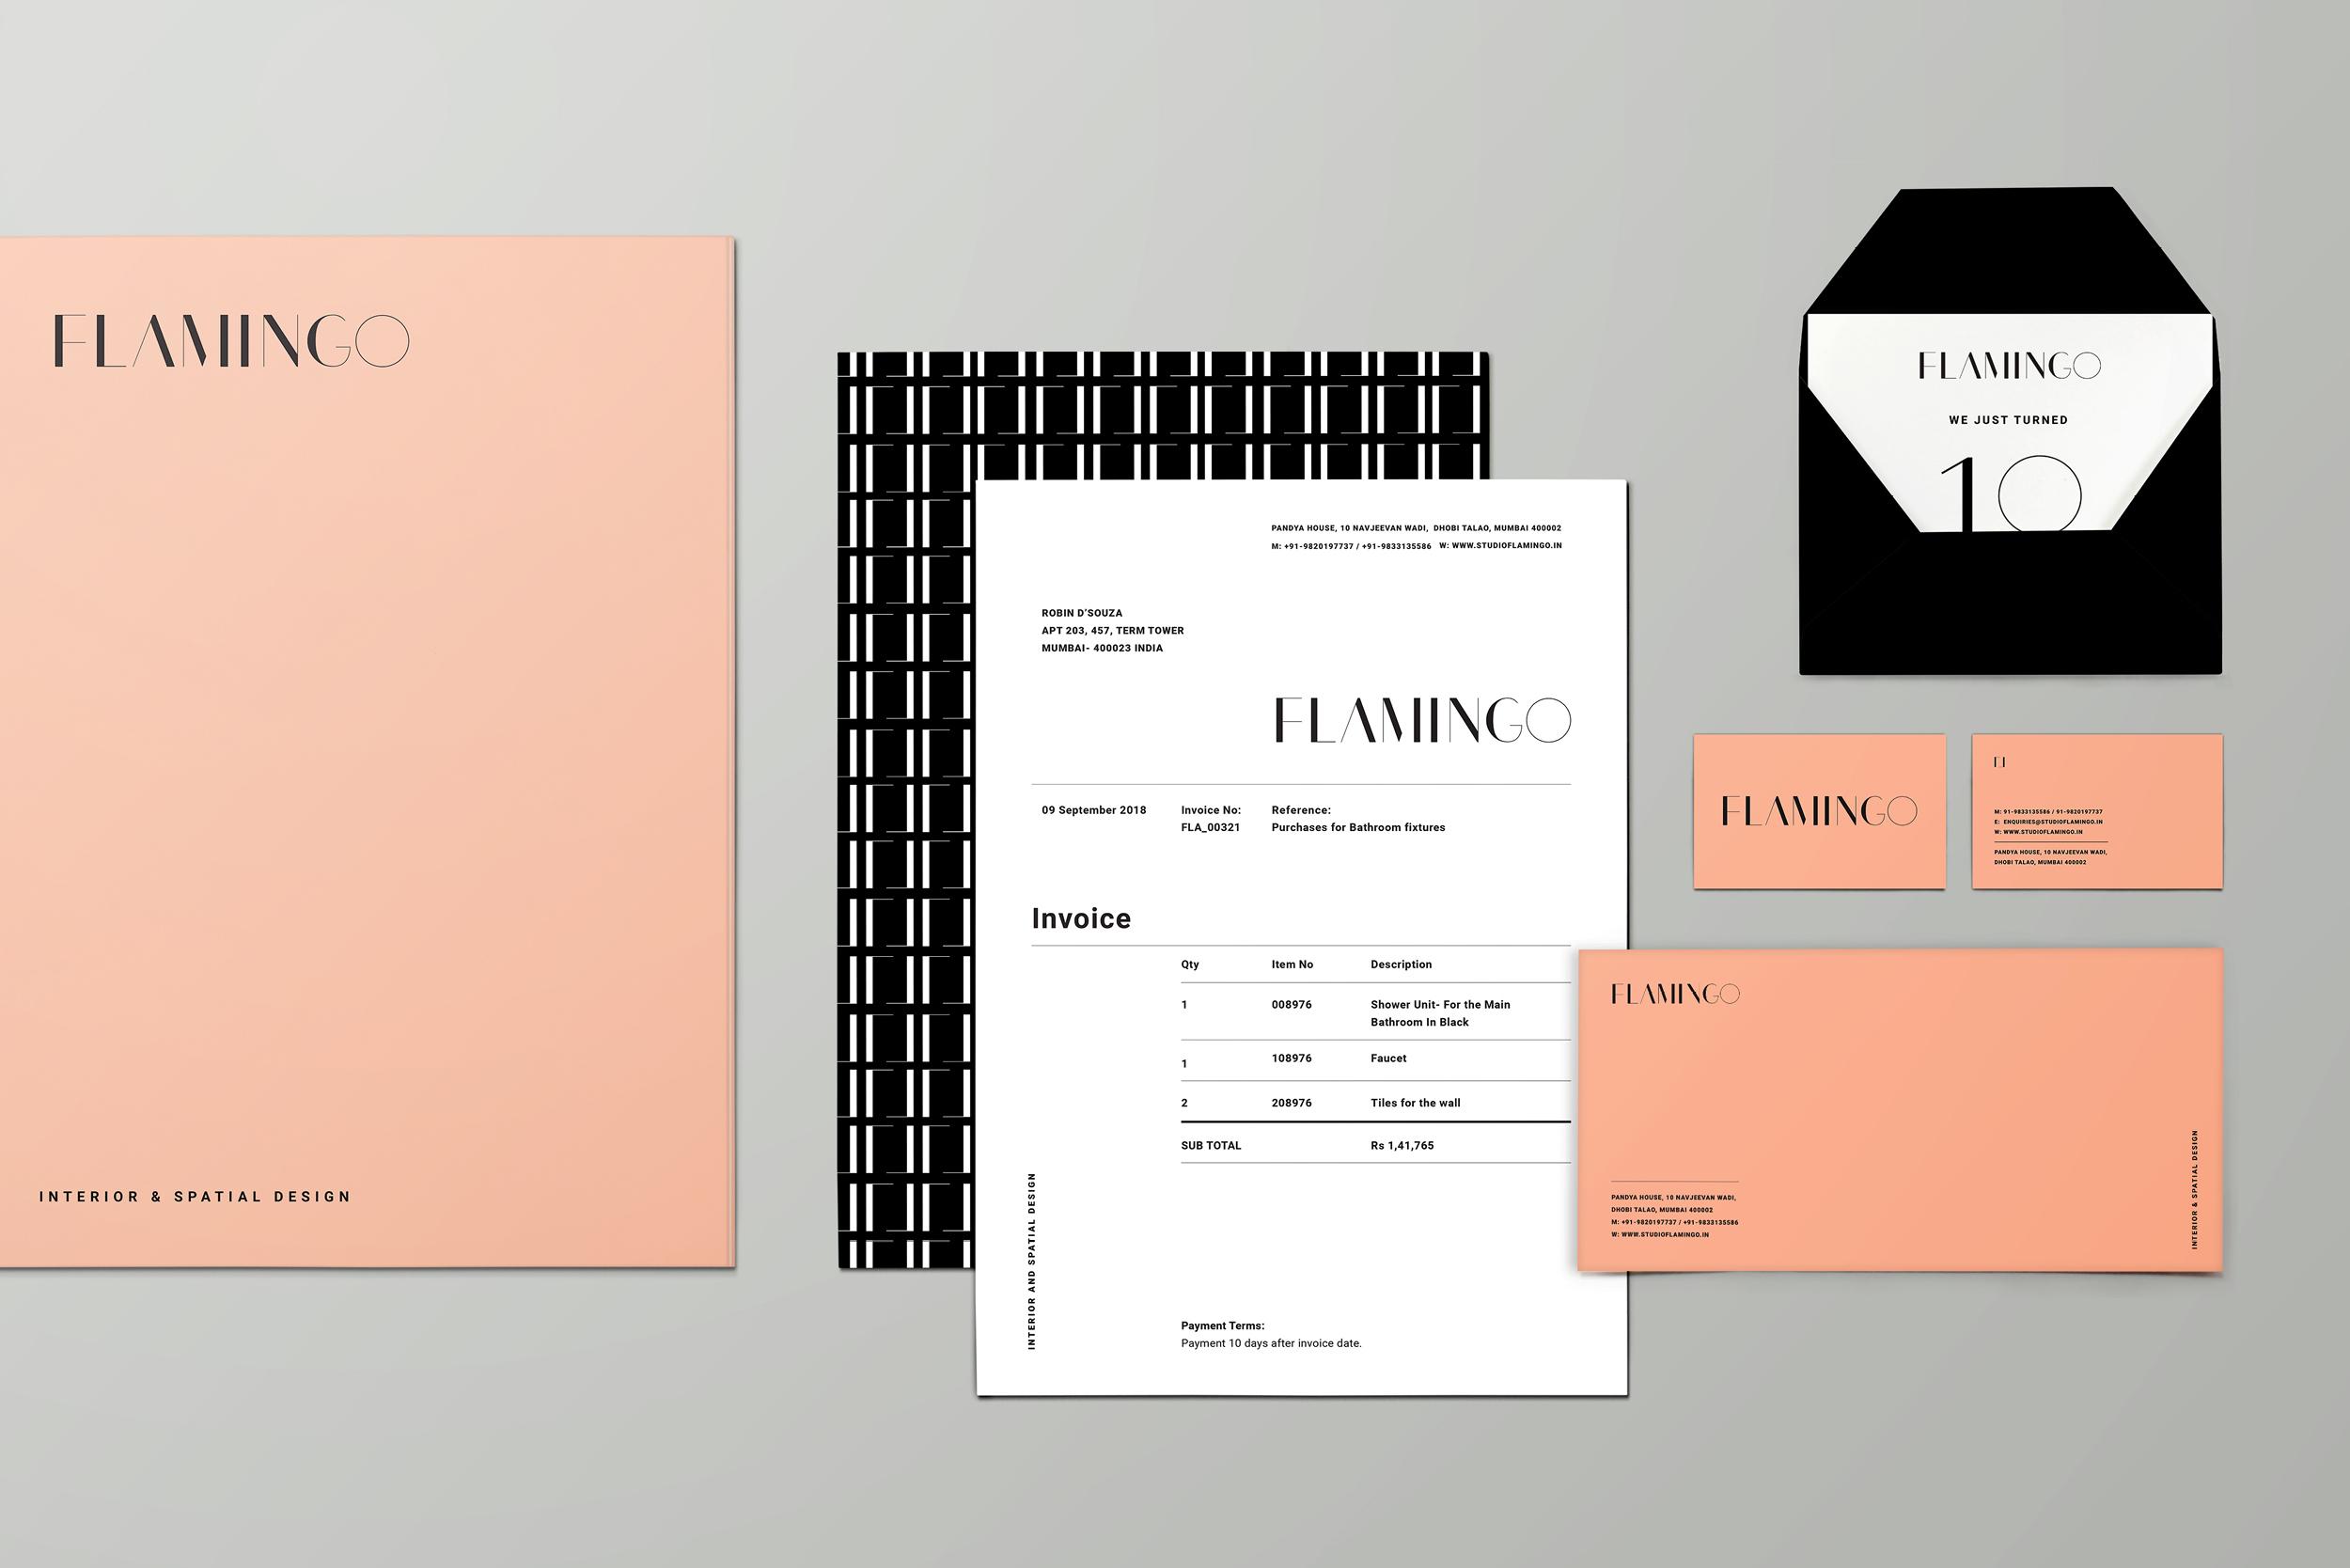 Flamingo template5.jpg